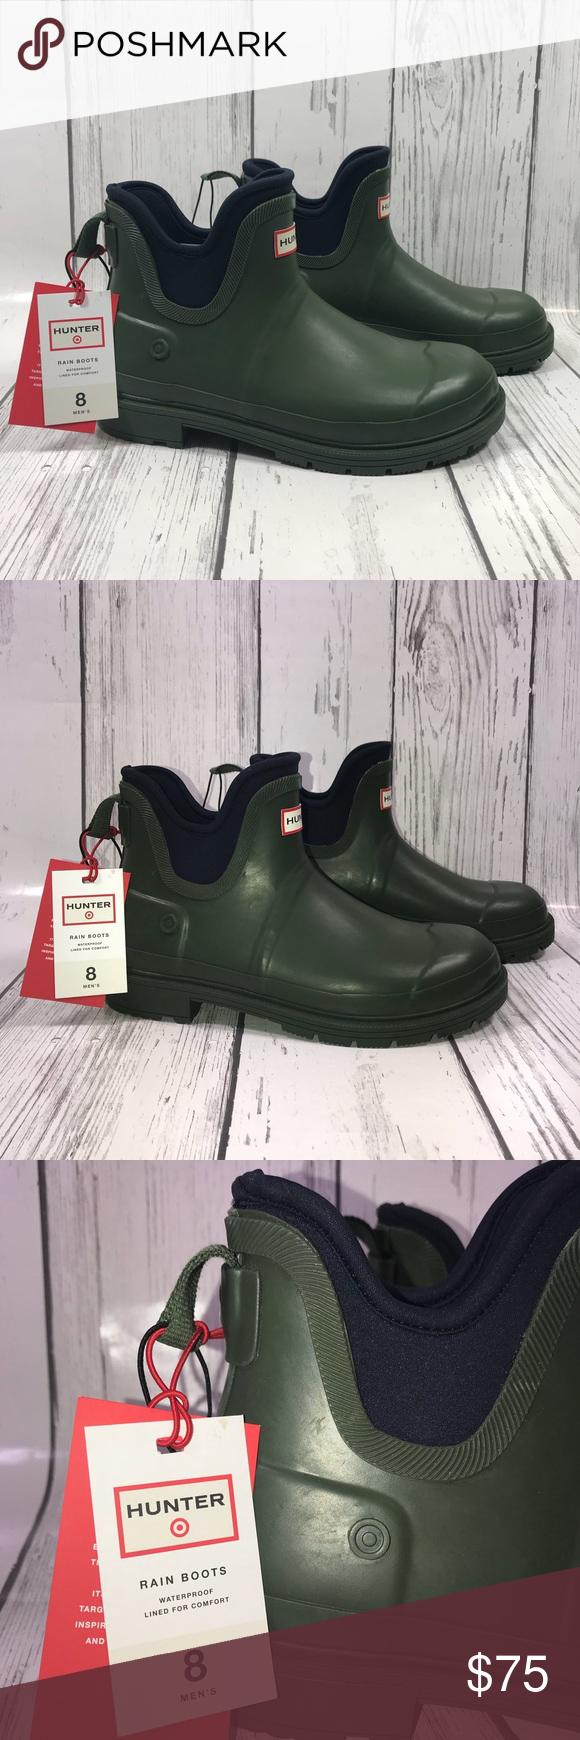 d078216436d Hunter for Target Men's Ankle Rain Boots Size 8 Hunter for Target ...